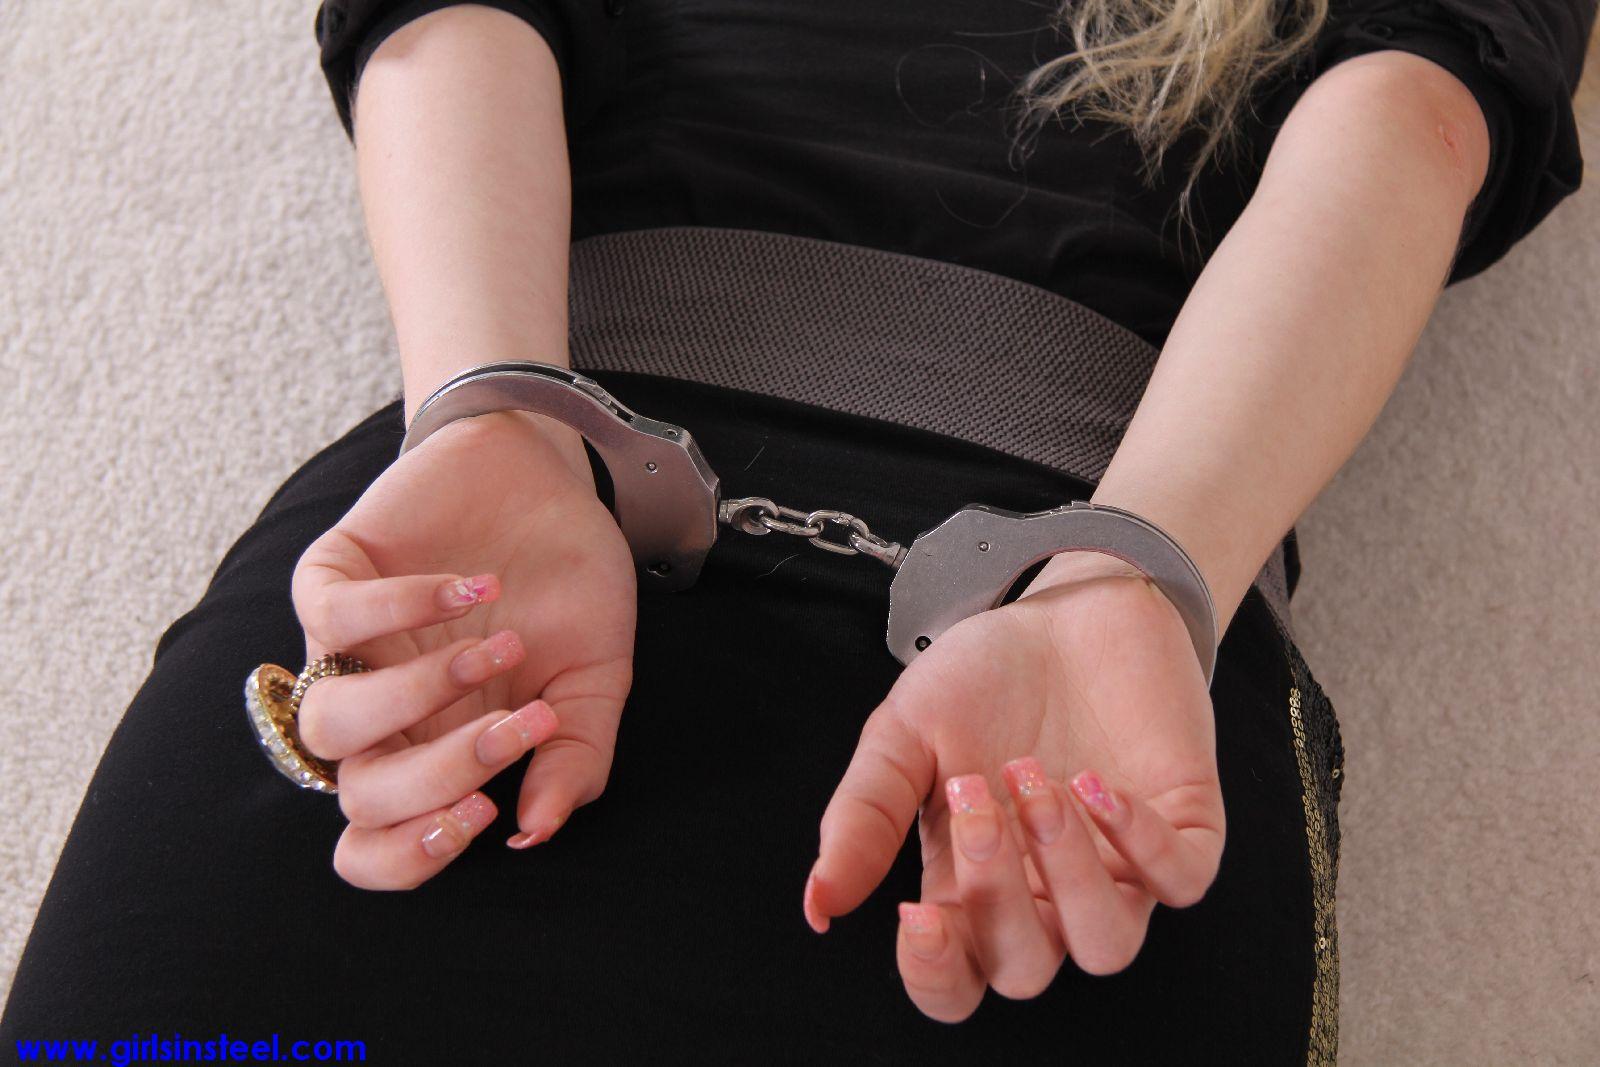 Many thanks bondage handcuffed handcuffs hogtied